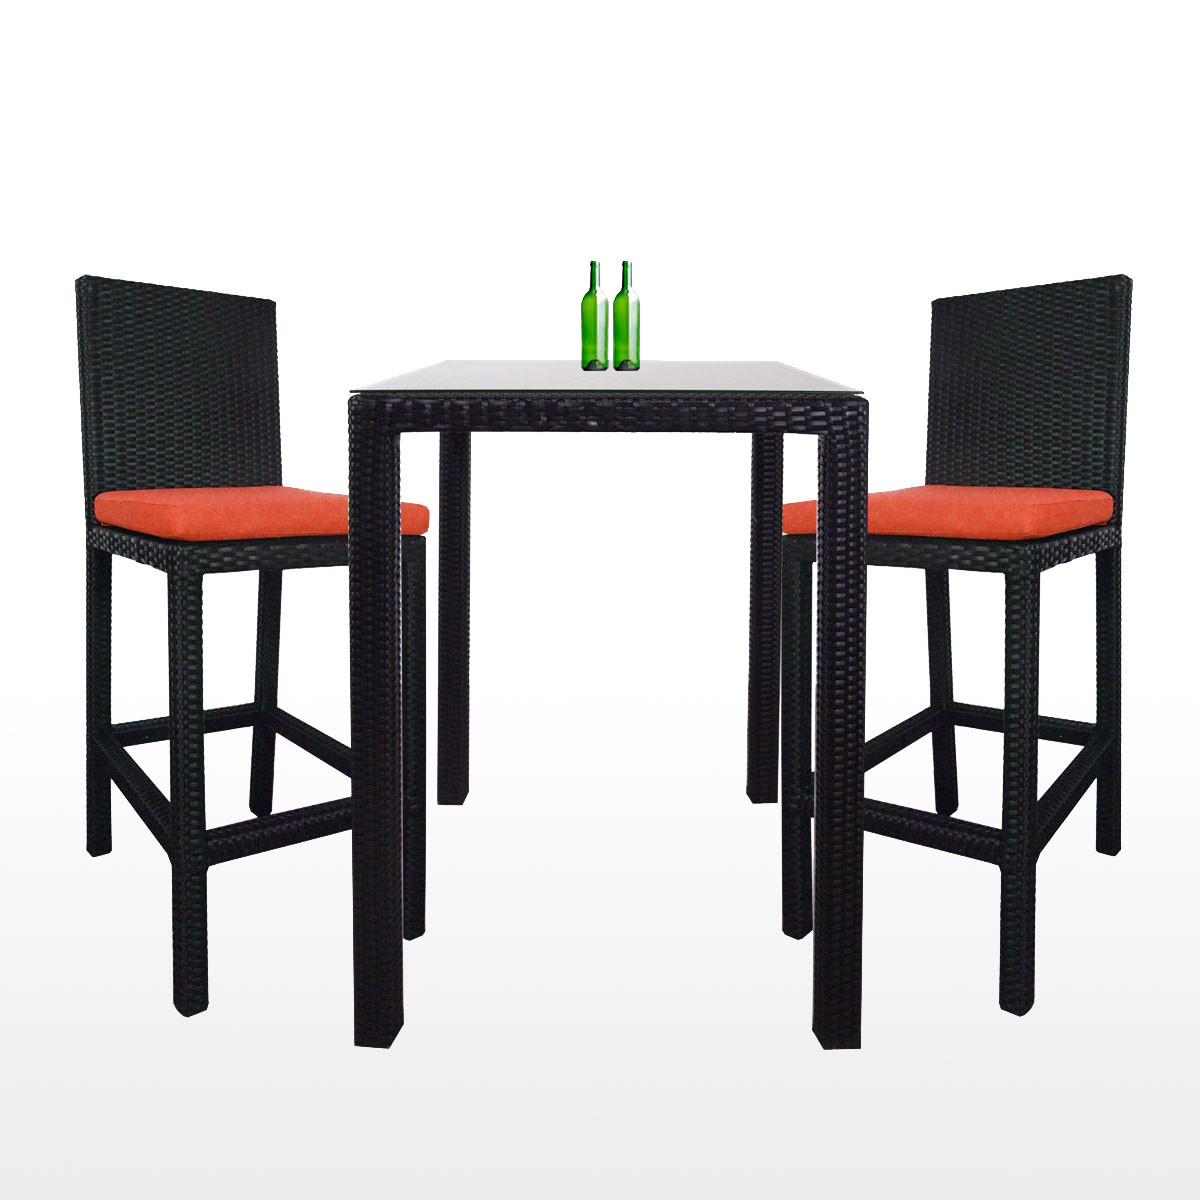 Midas 2 Chair Bar Set Orange Cushion 2 Year Warranty Furniture Home D Cor Fortytwo